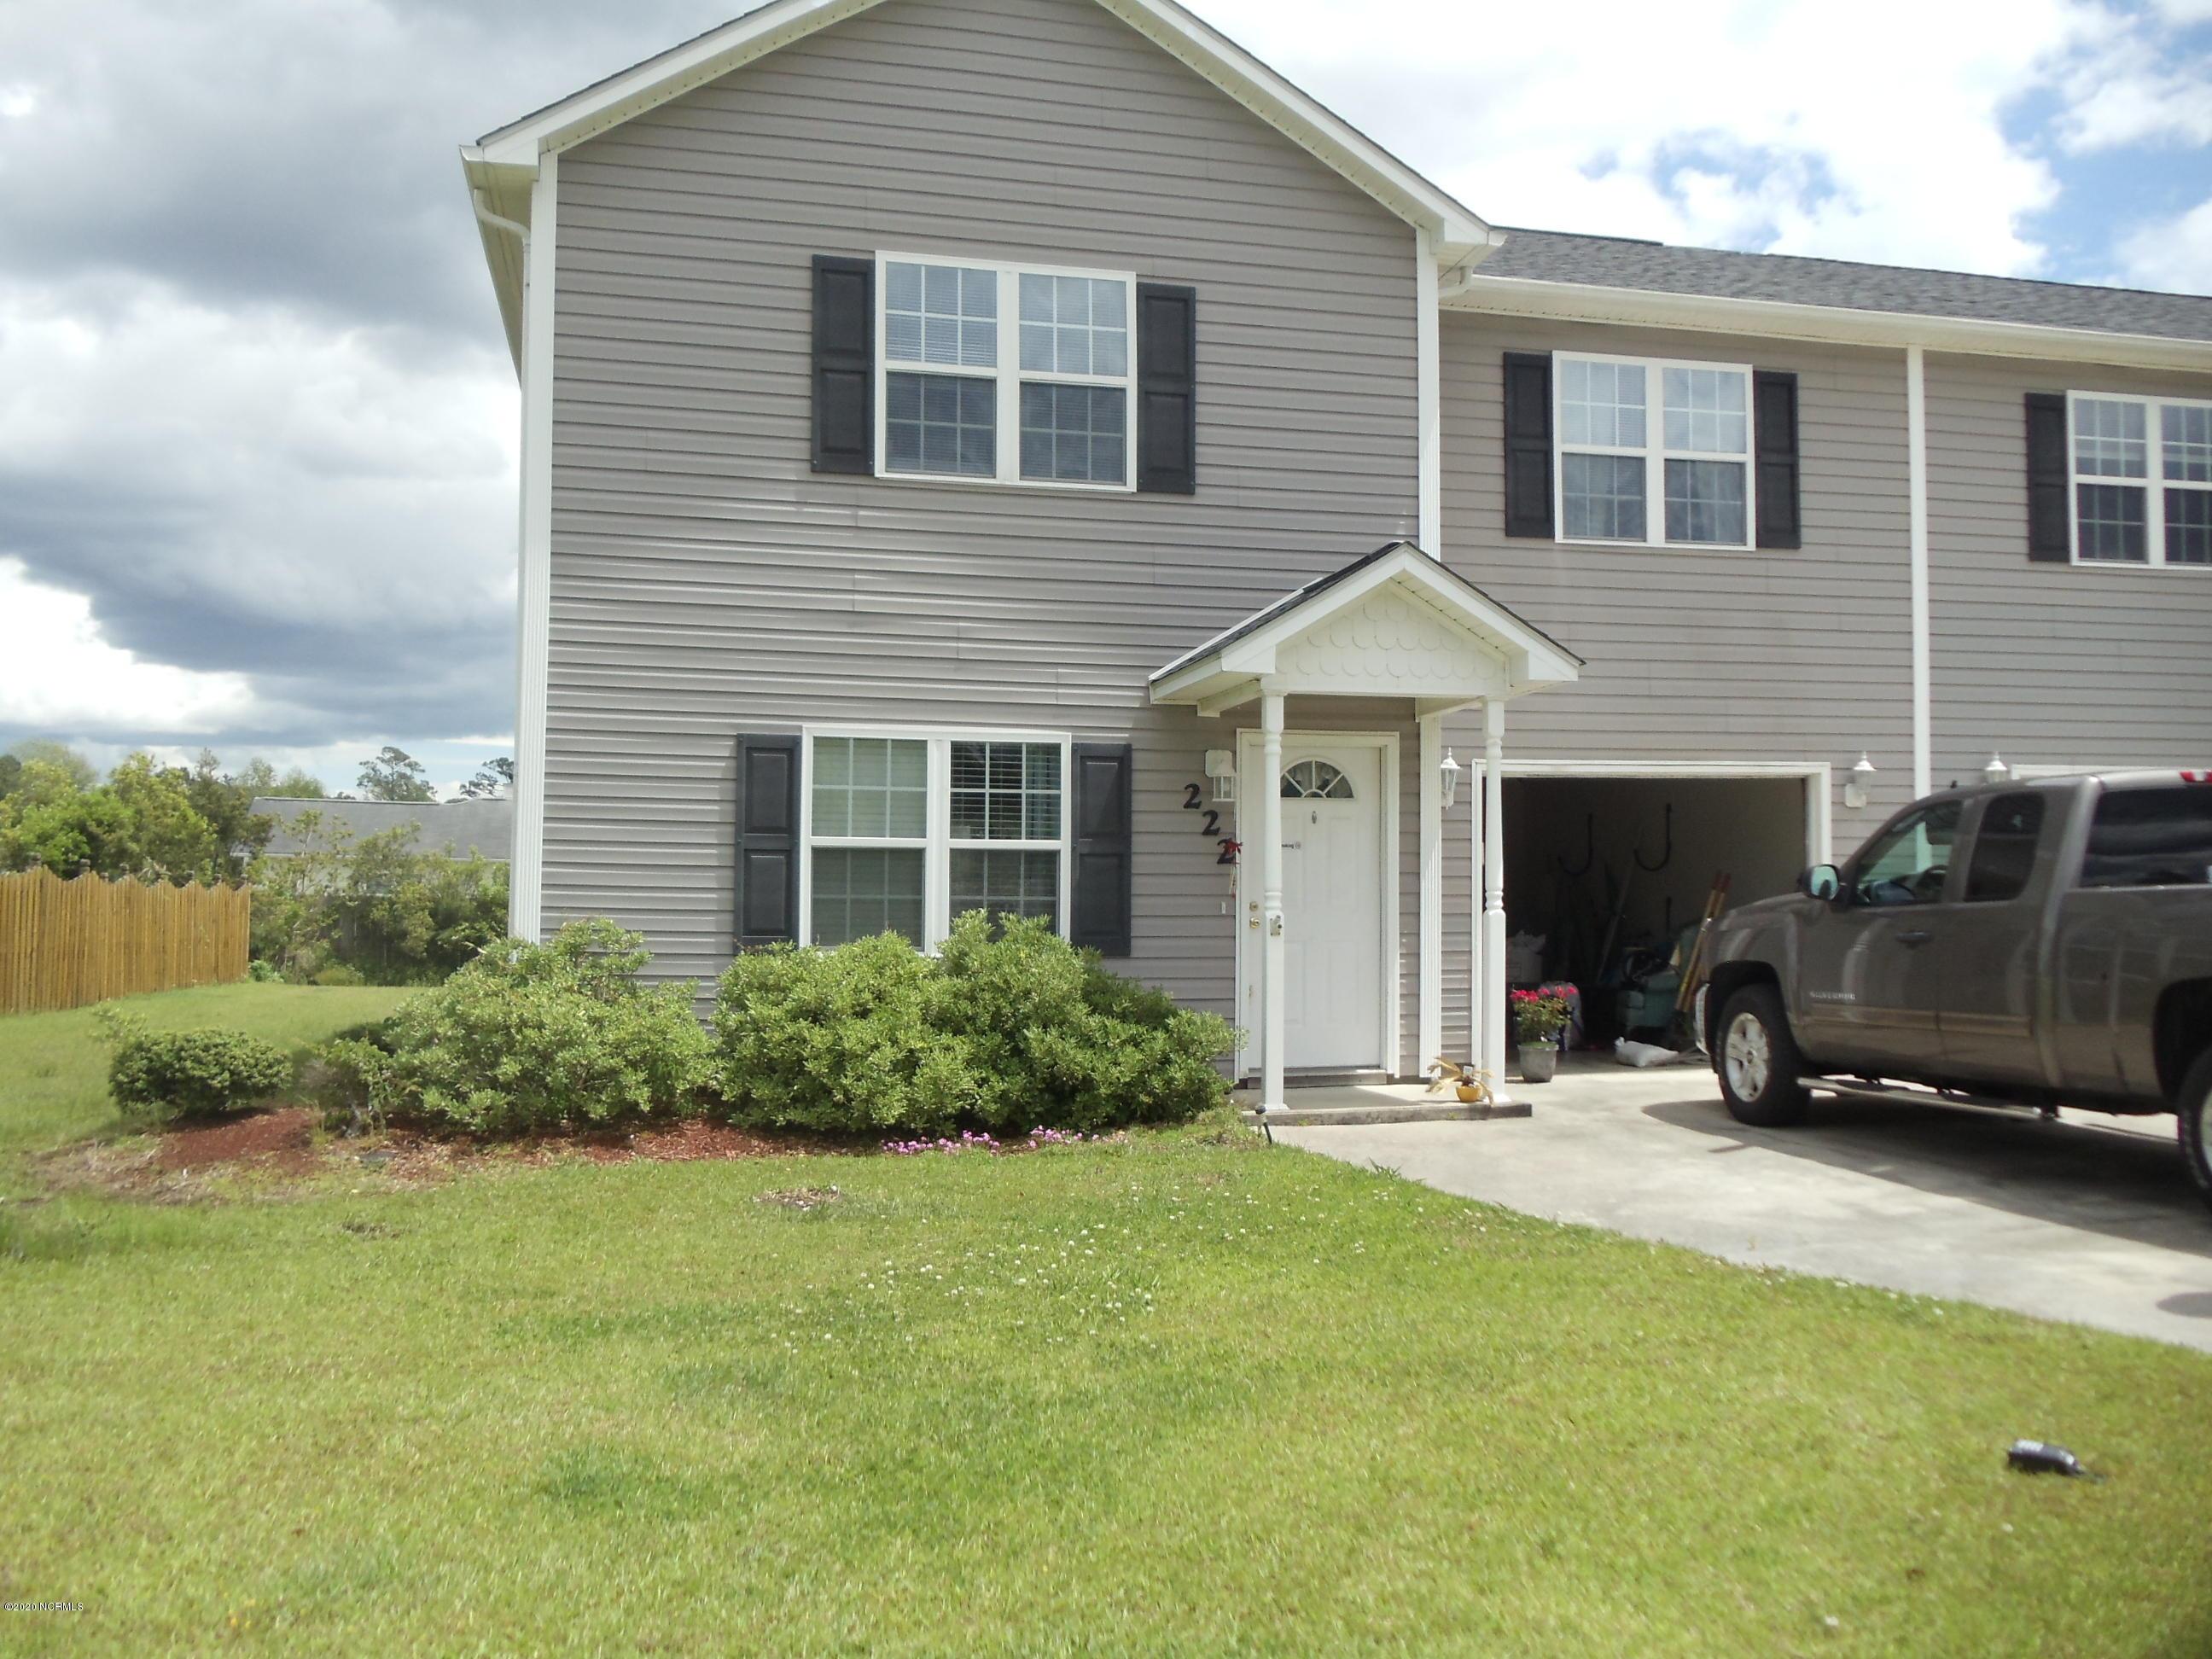 222 Smallwood Road, Hubert, North Carolina 28539, 3 Bedrooms Bedrooms, ,2 BathroomsBathrooms,Residential,For Sale,Smallwood,100215573